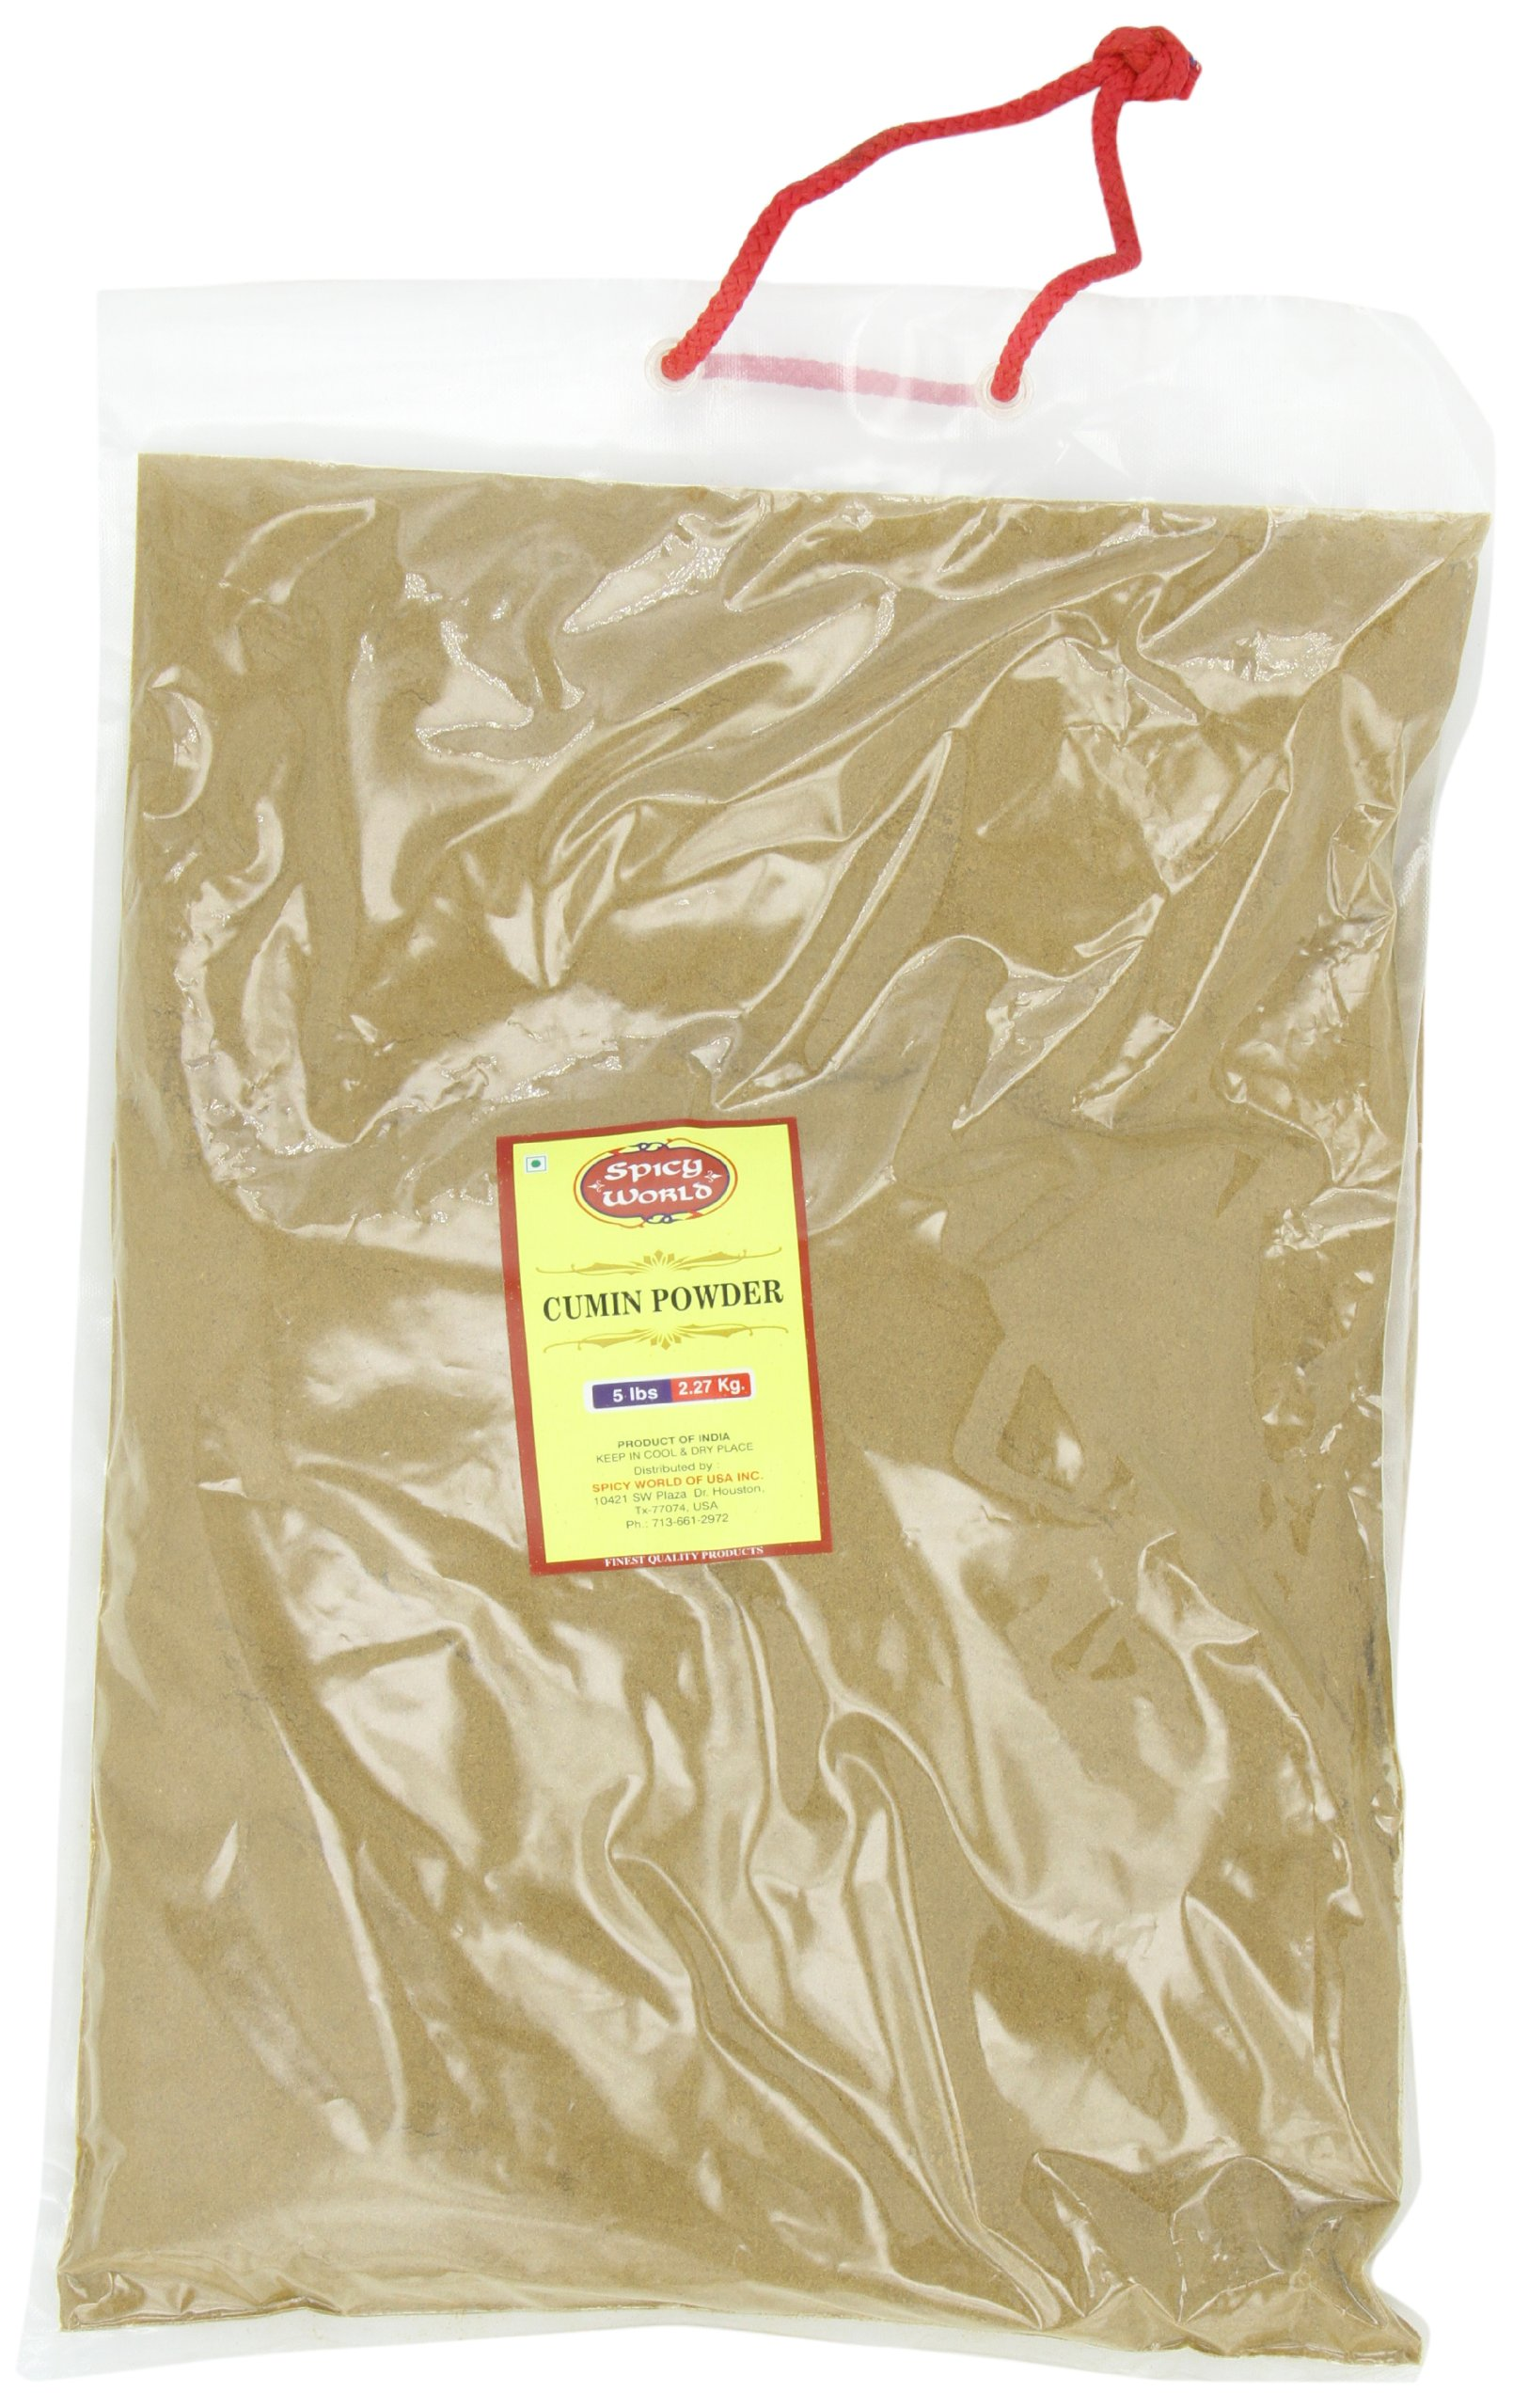 Spicy World Ground Cumin Powder Bulk, 5-Pounds